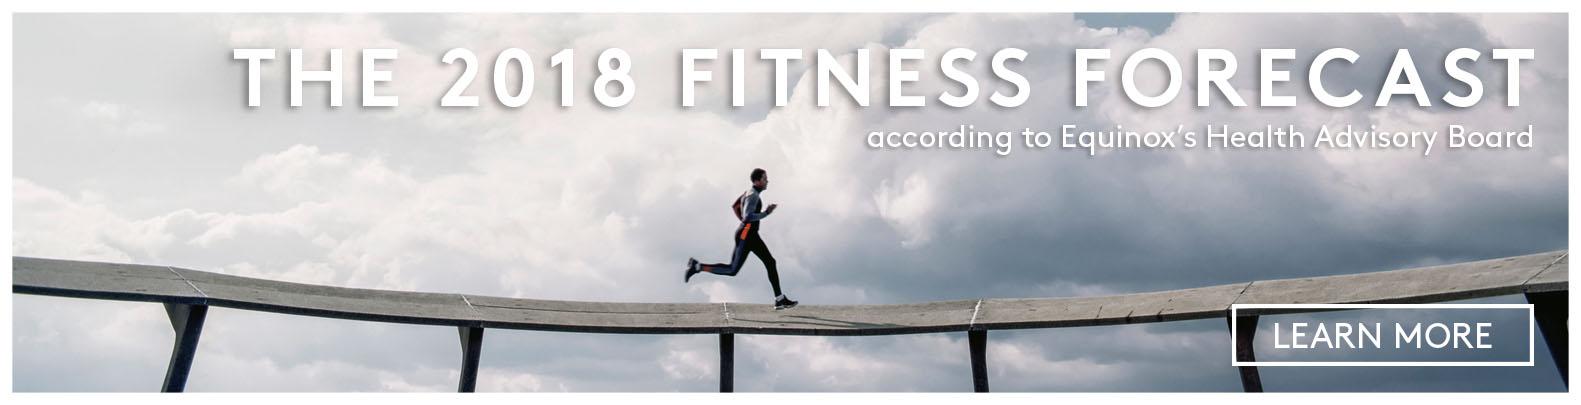 2018 Fitness Forecast